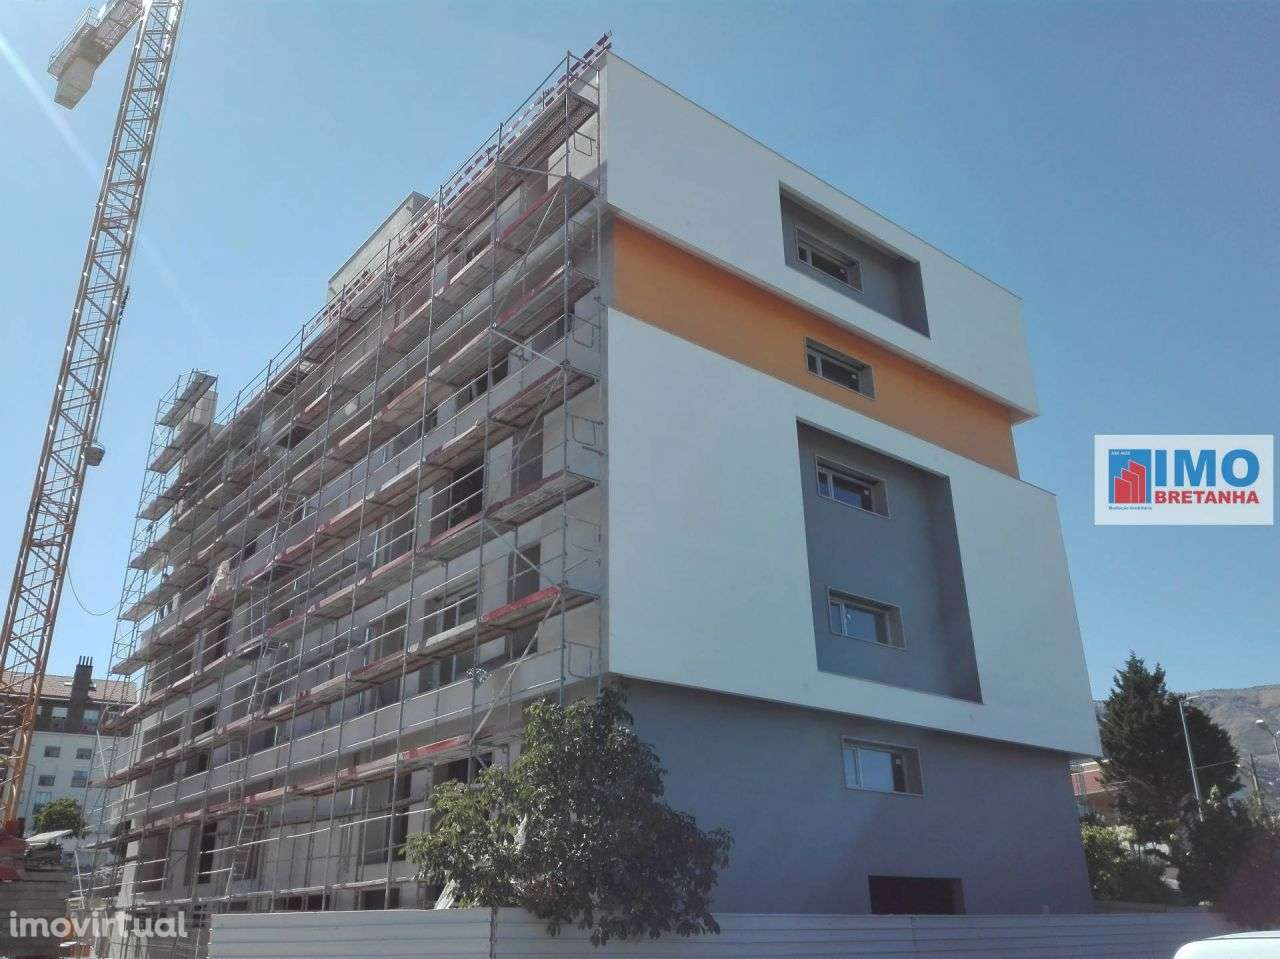 Apartamento para comprar, Covilhã e Canhoso, Covilhã, Castelo Branco - Foto 4